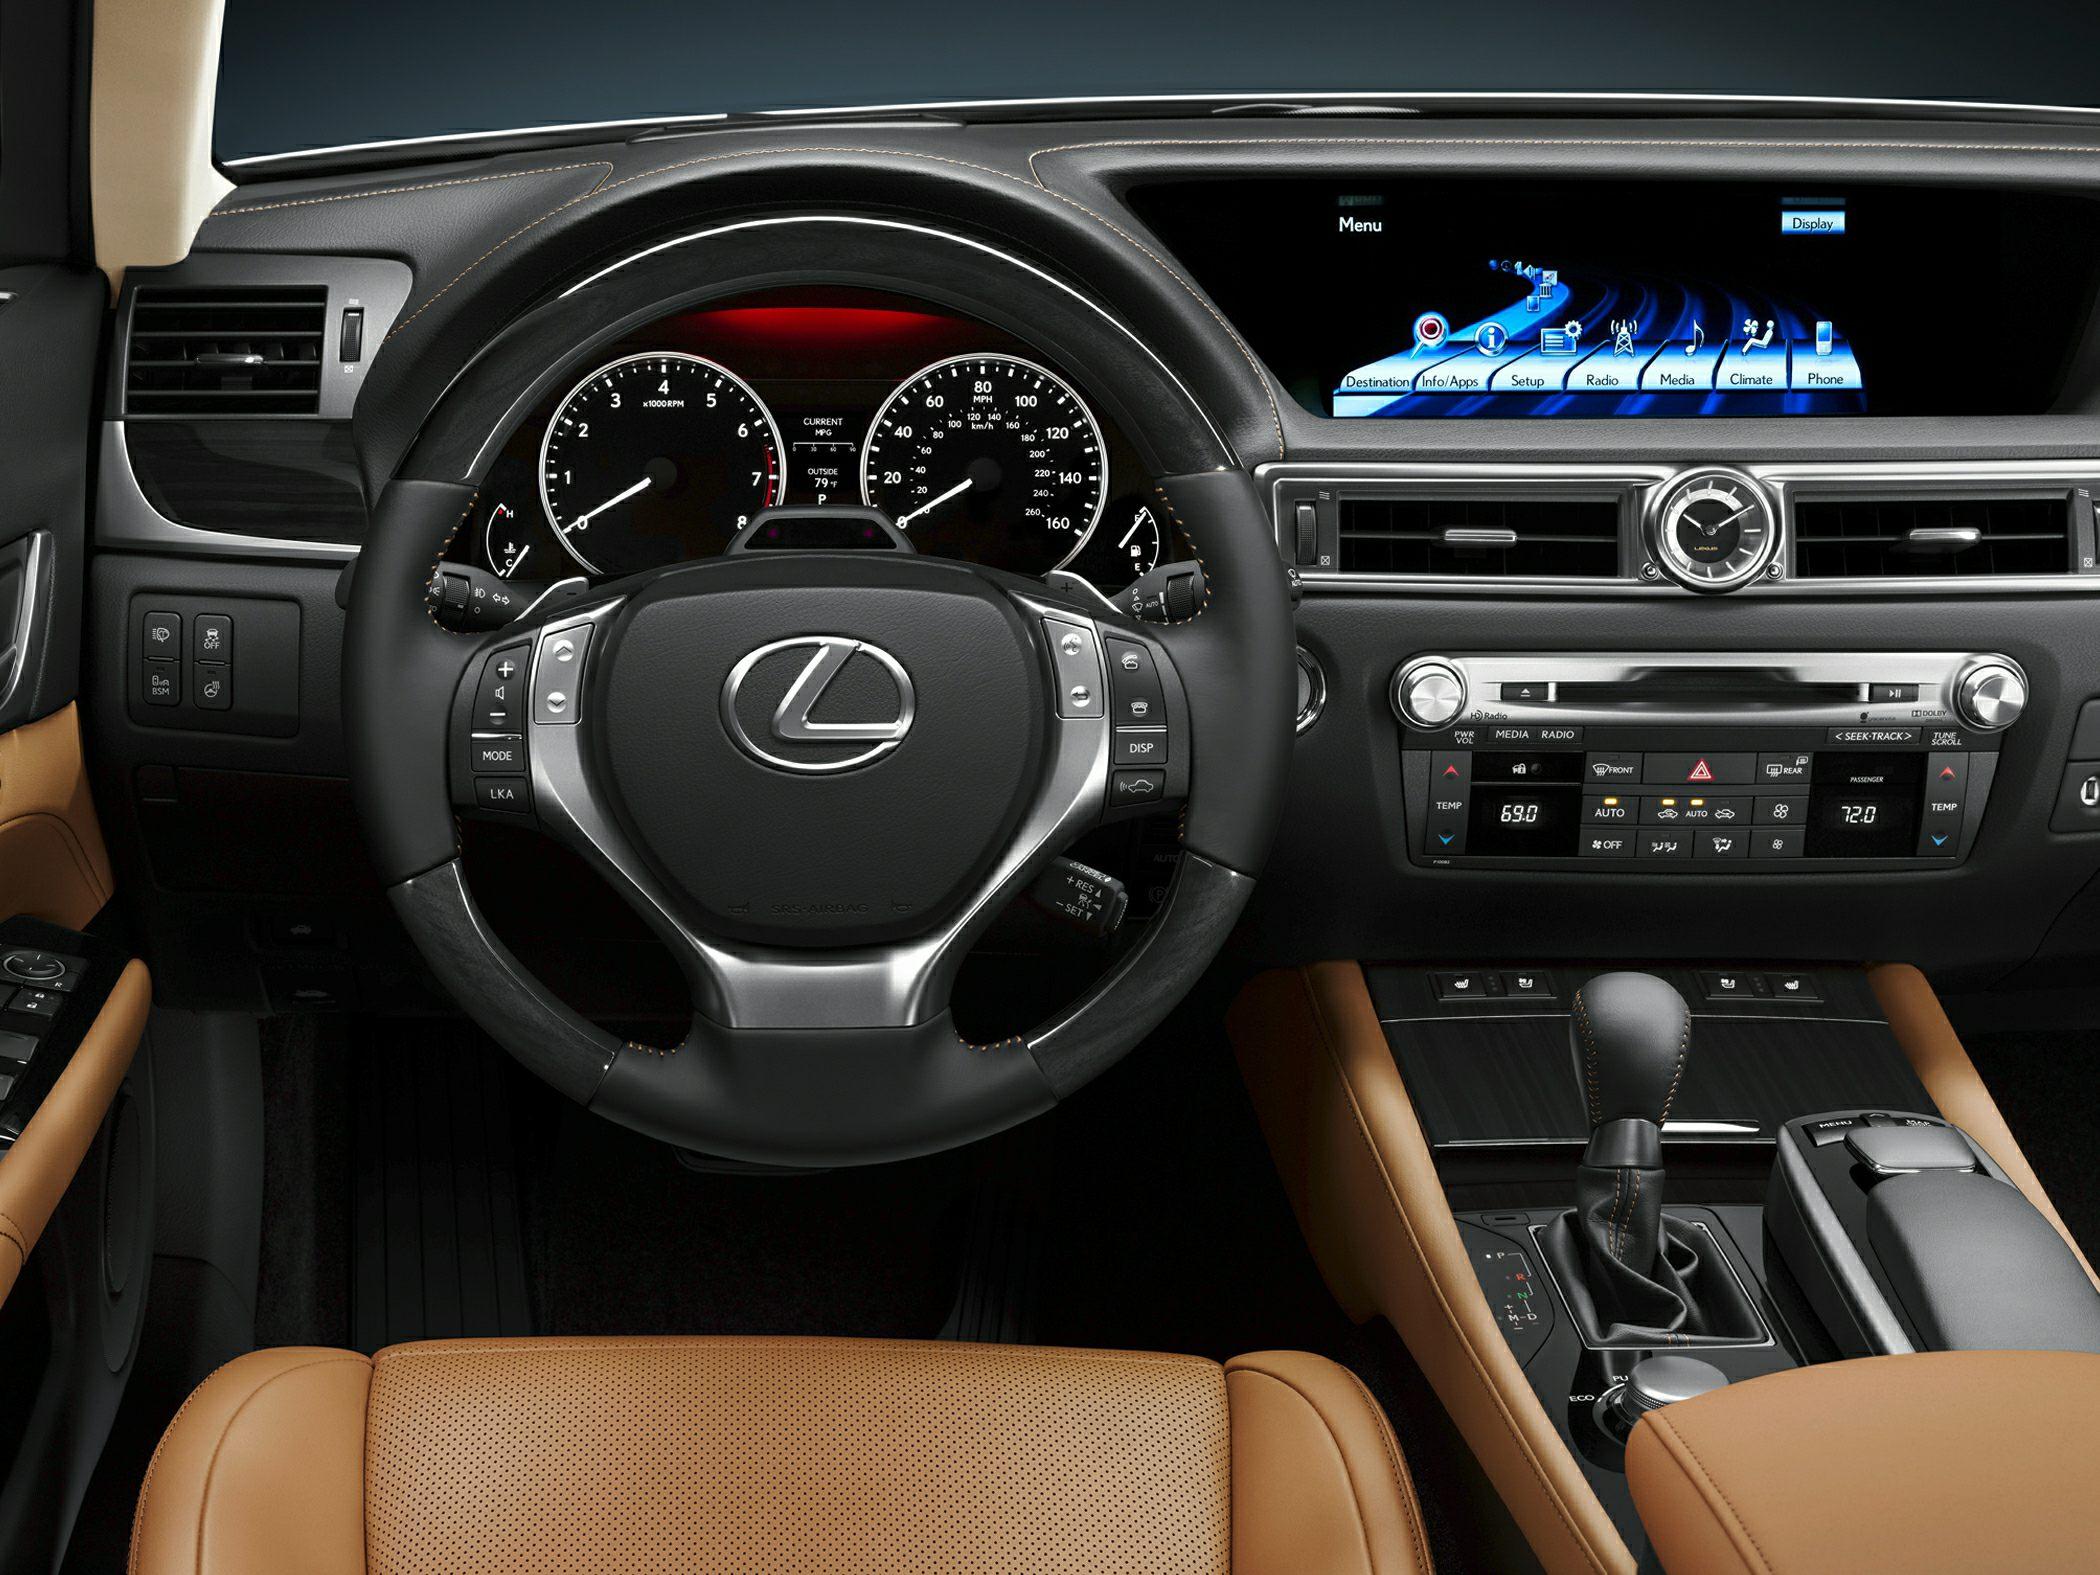 2014 Lexus GS 350 #14 Lexus GS 350 #14